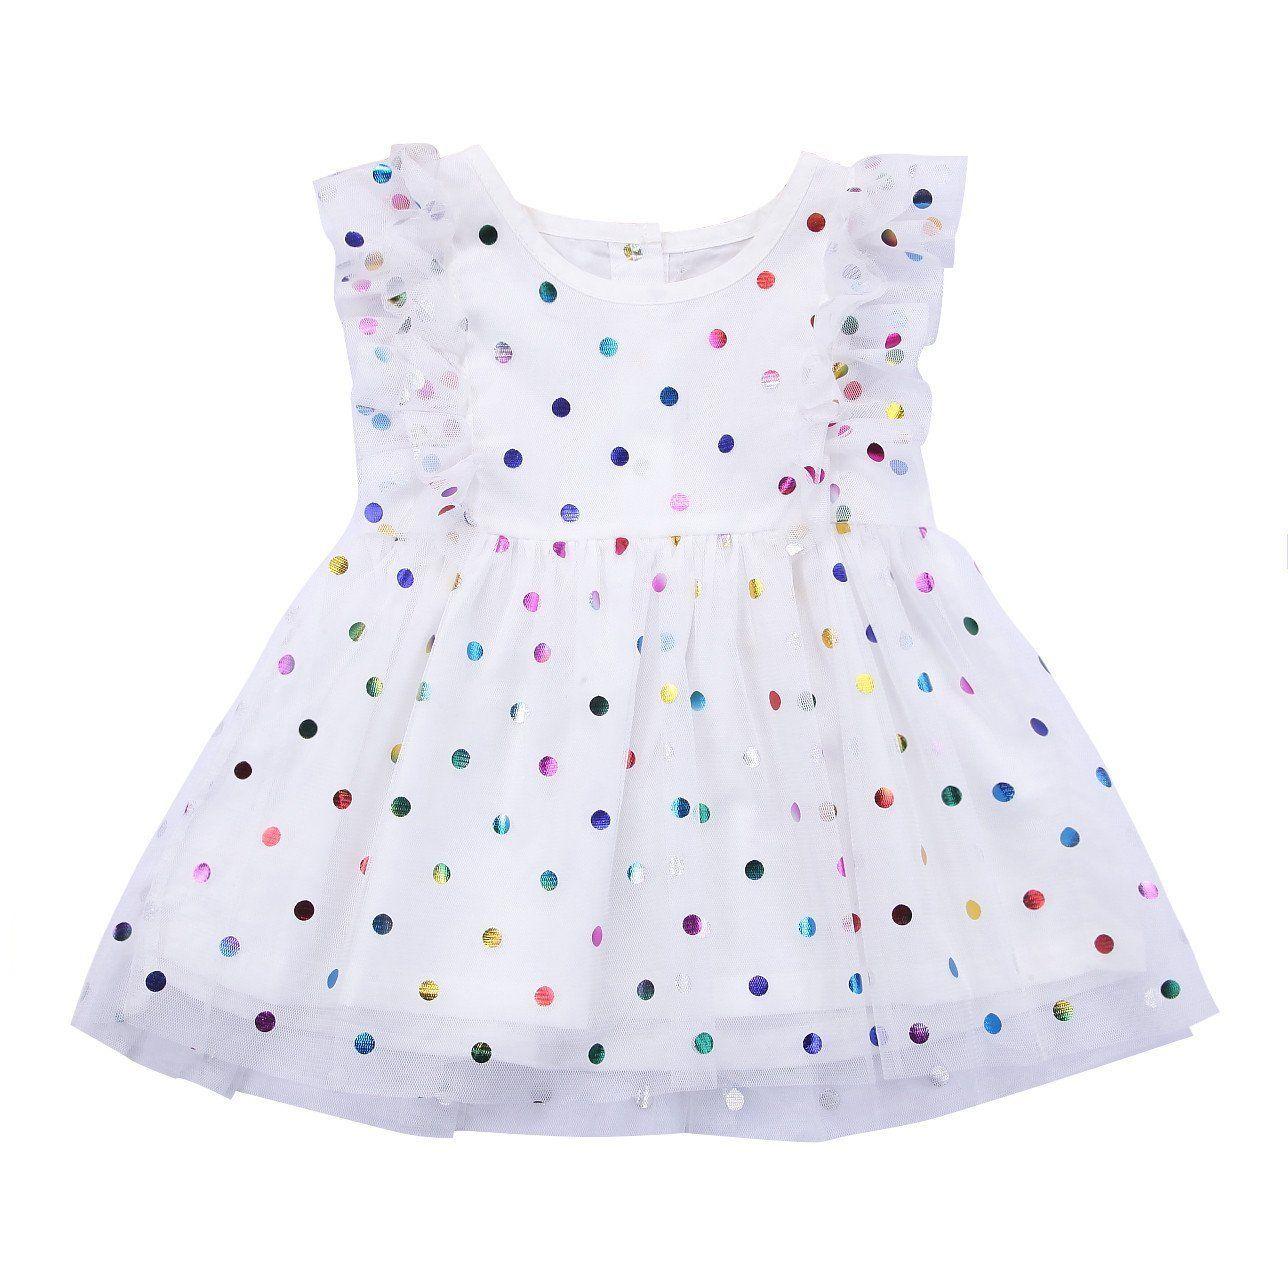 Jaimee Polka Dot Baby Dress The cutest multi colored